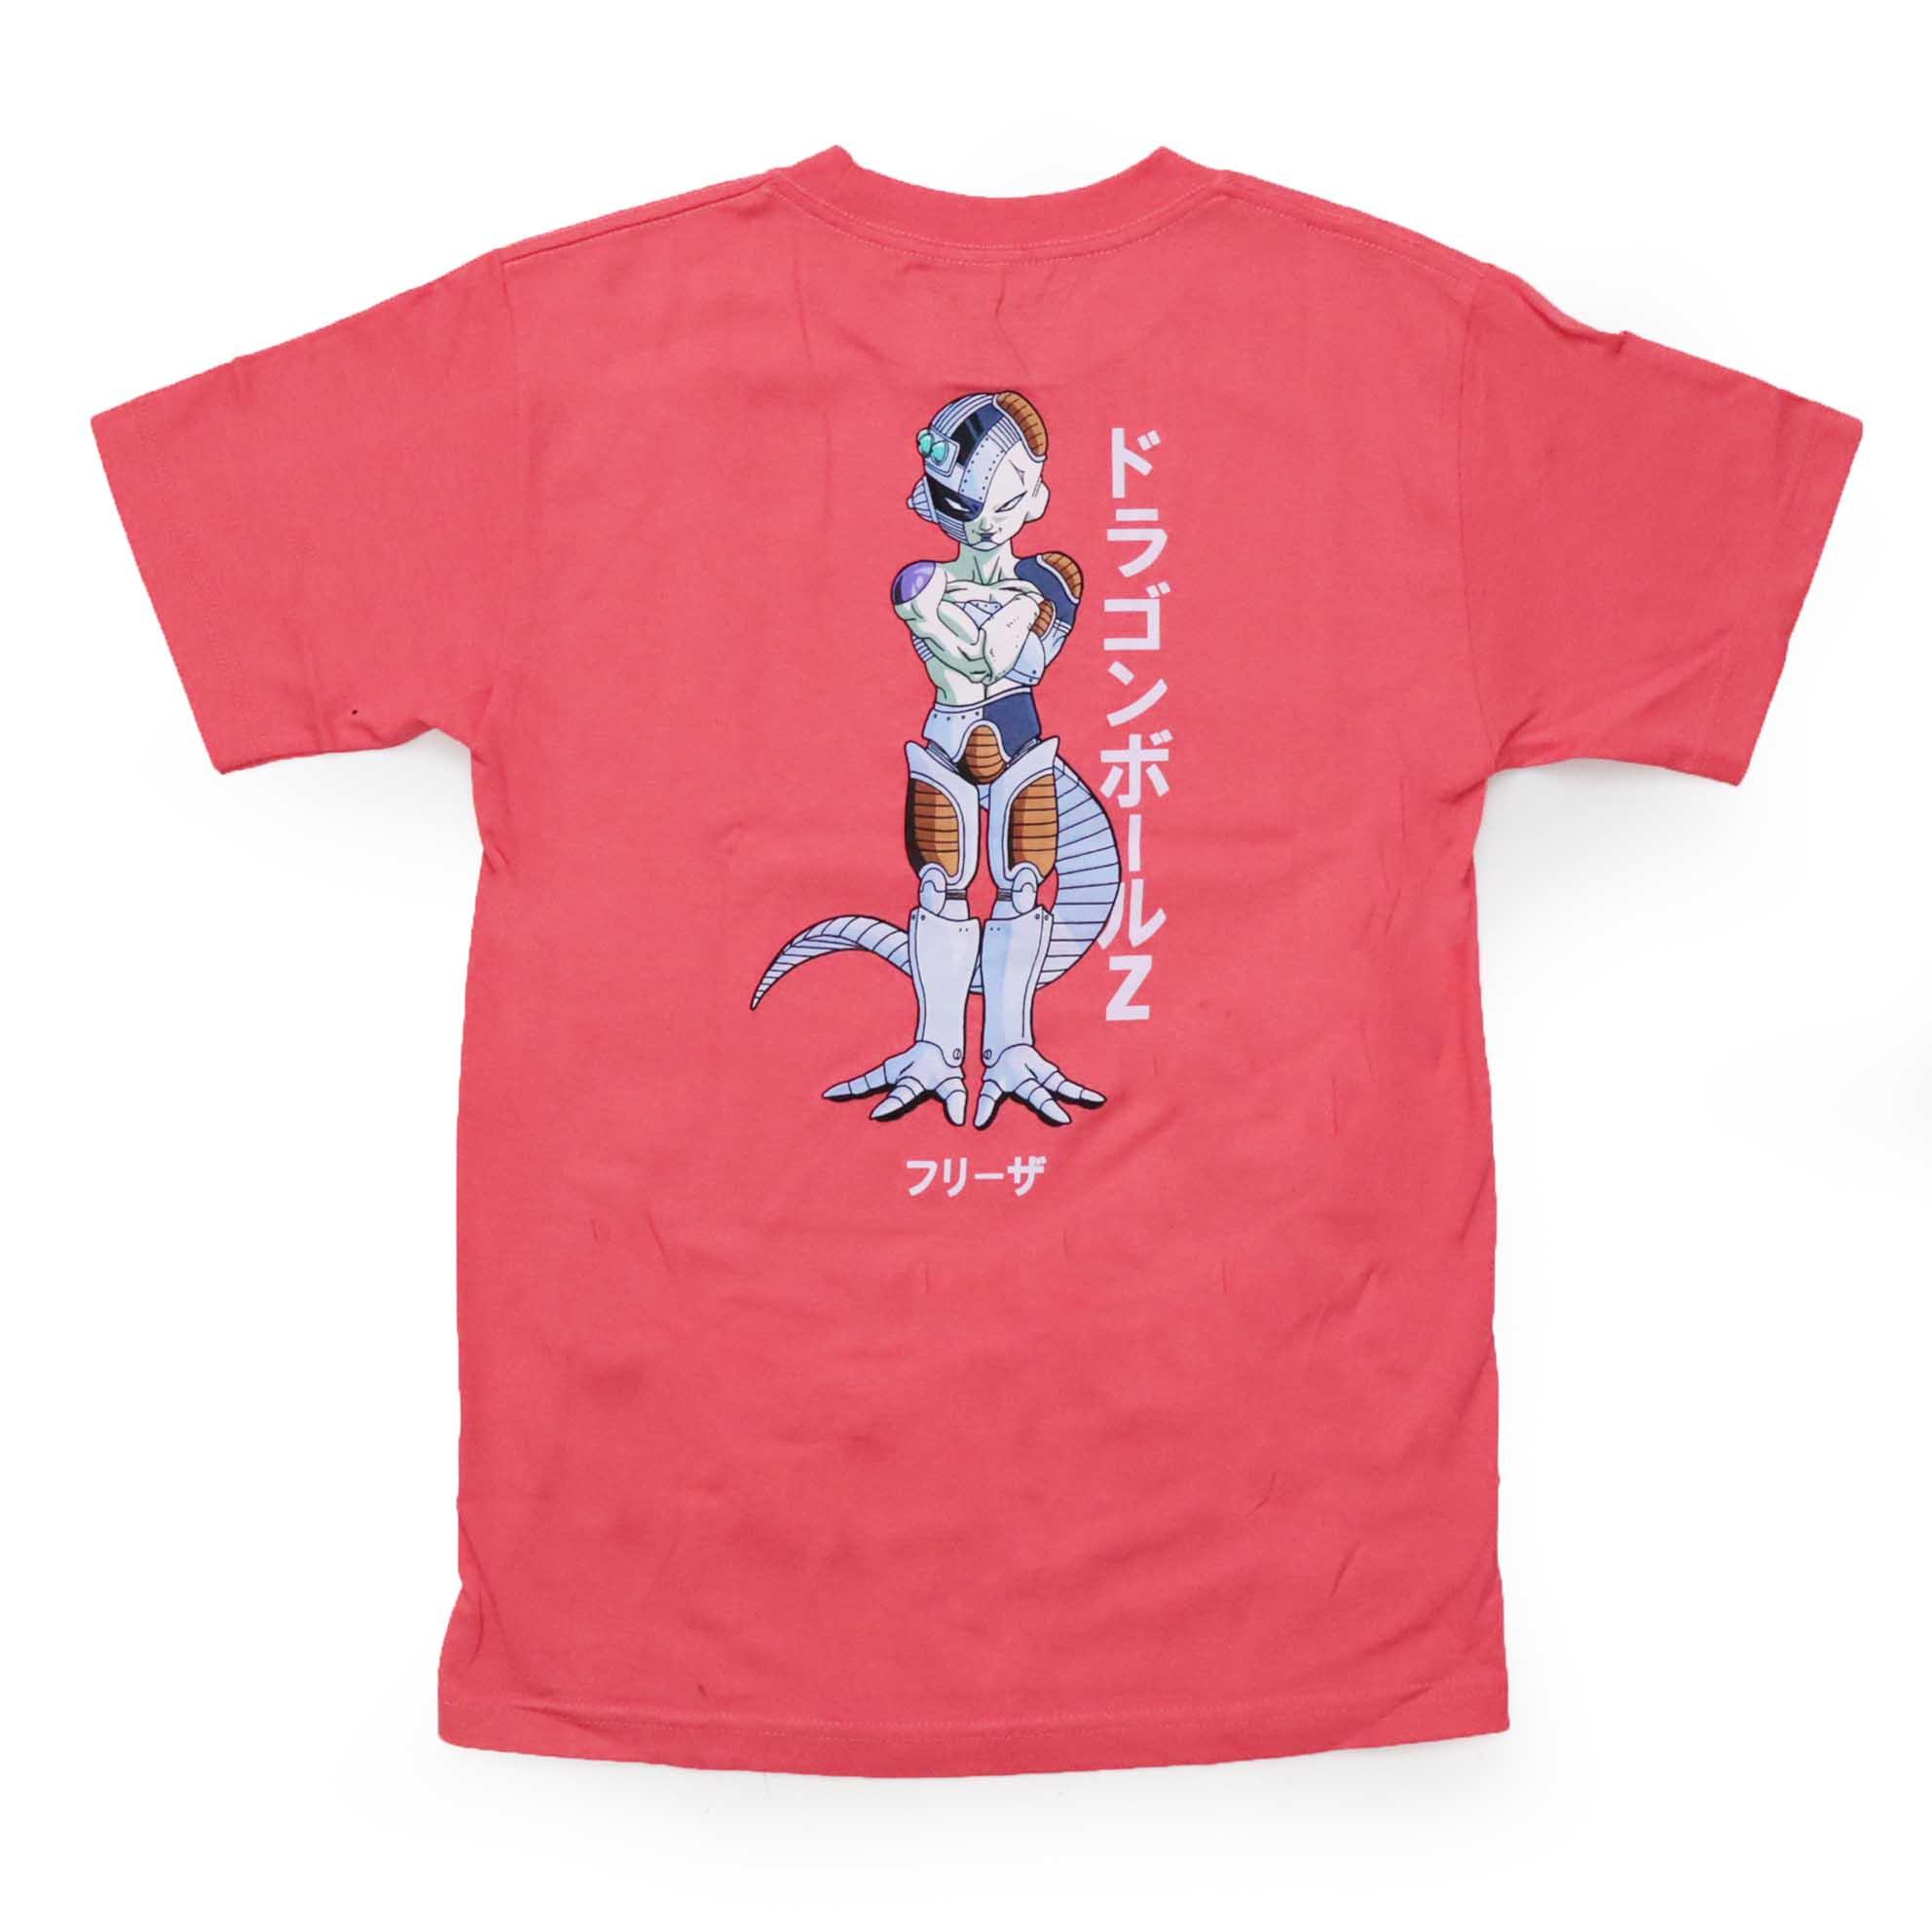 Camiseta Primitive x Dragon Ball Freeza Mecha - Coral (Importado)